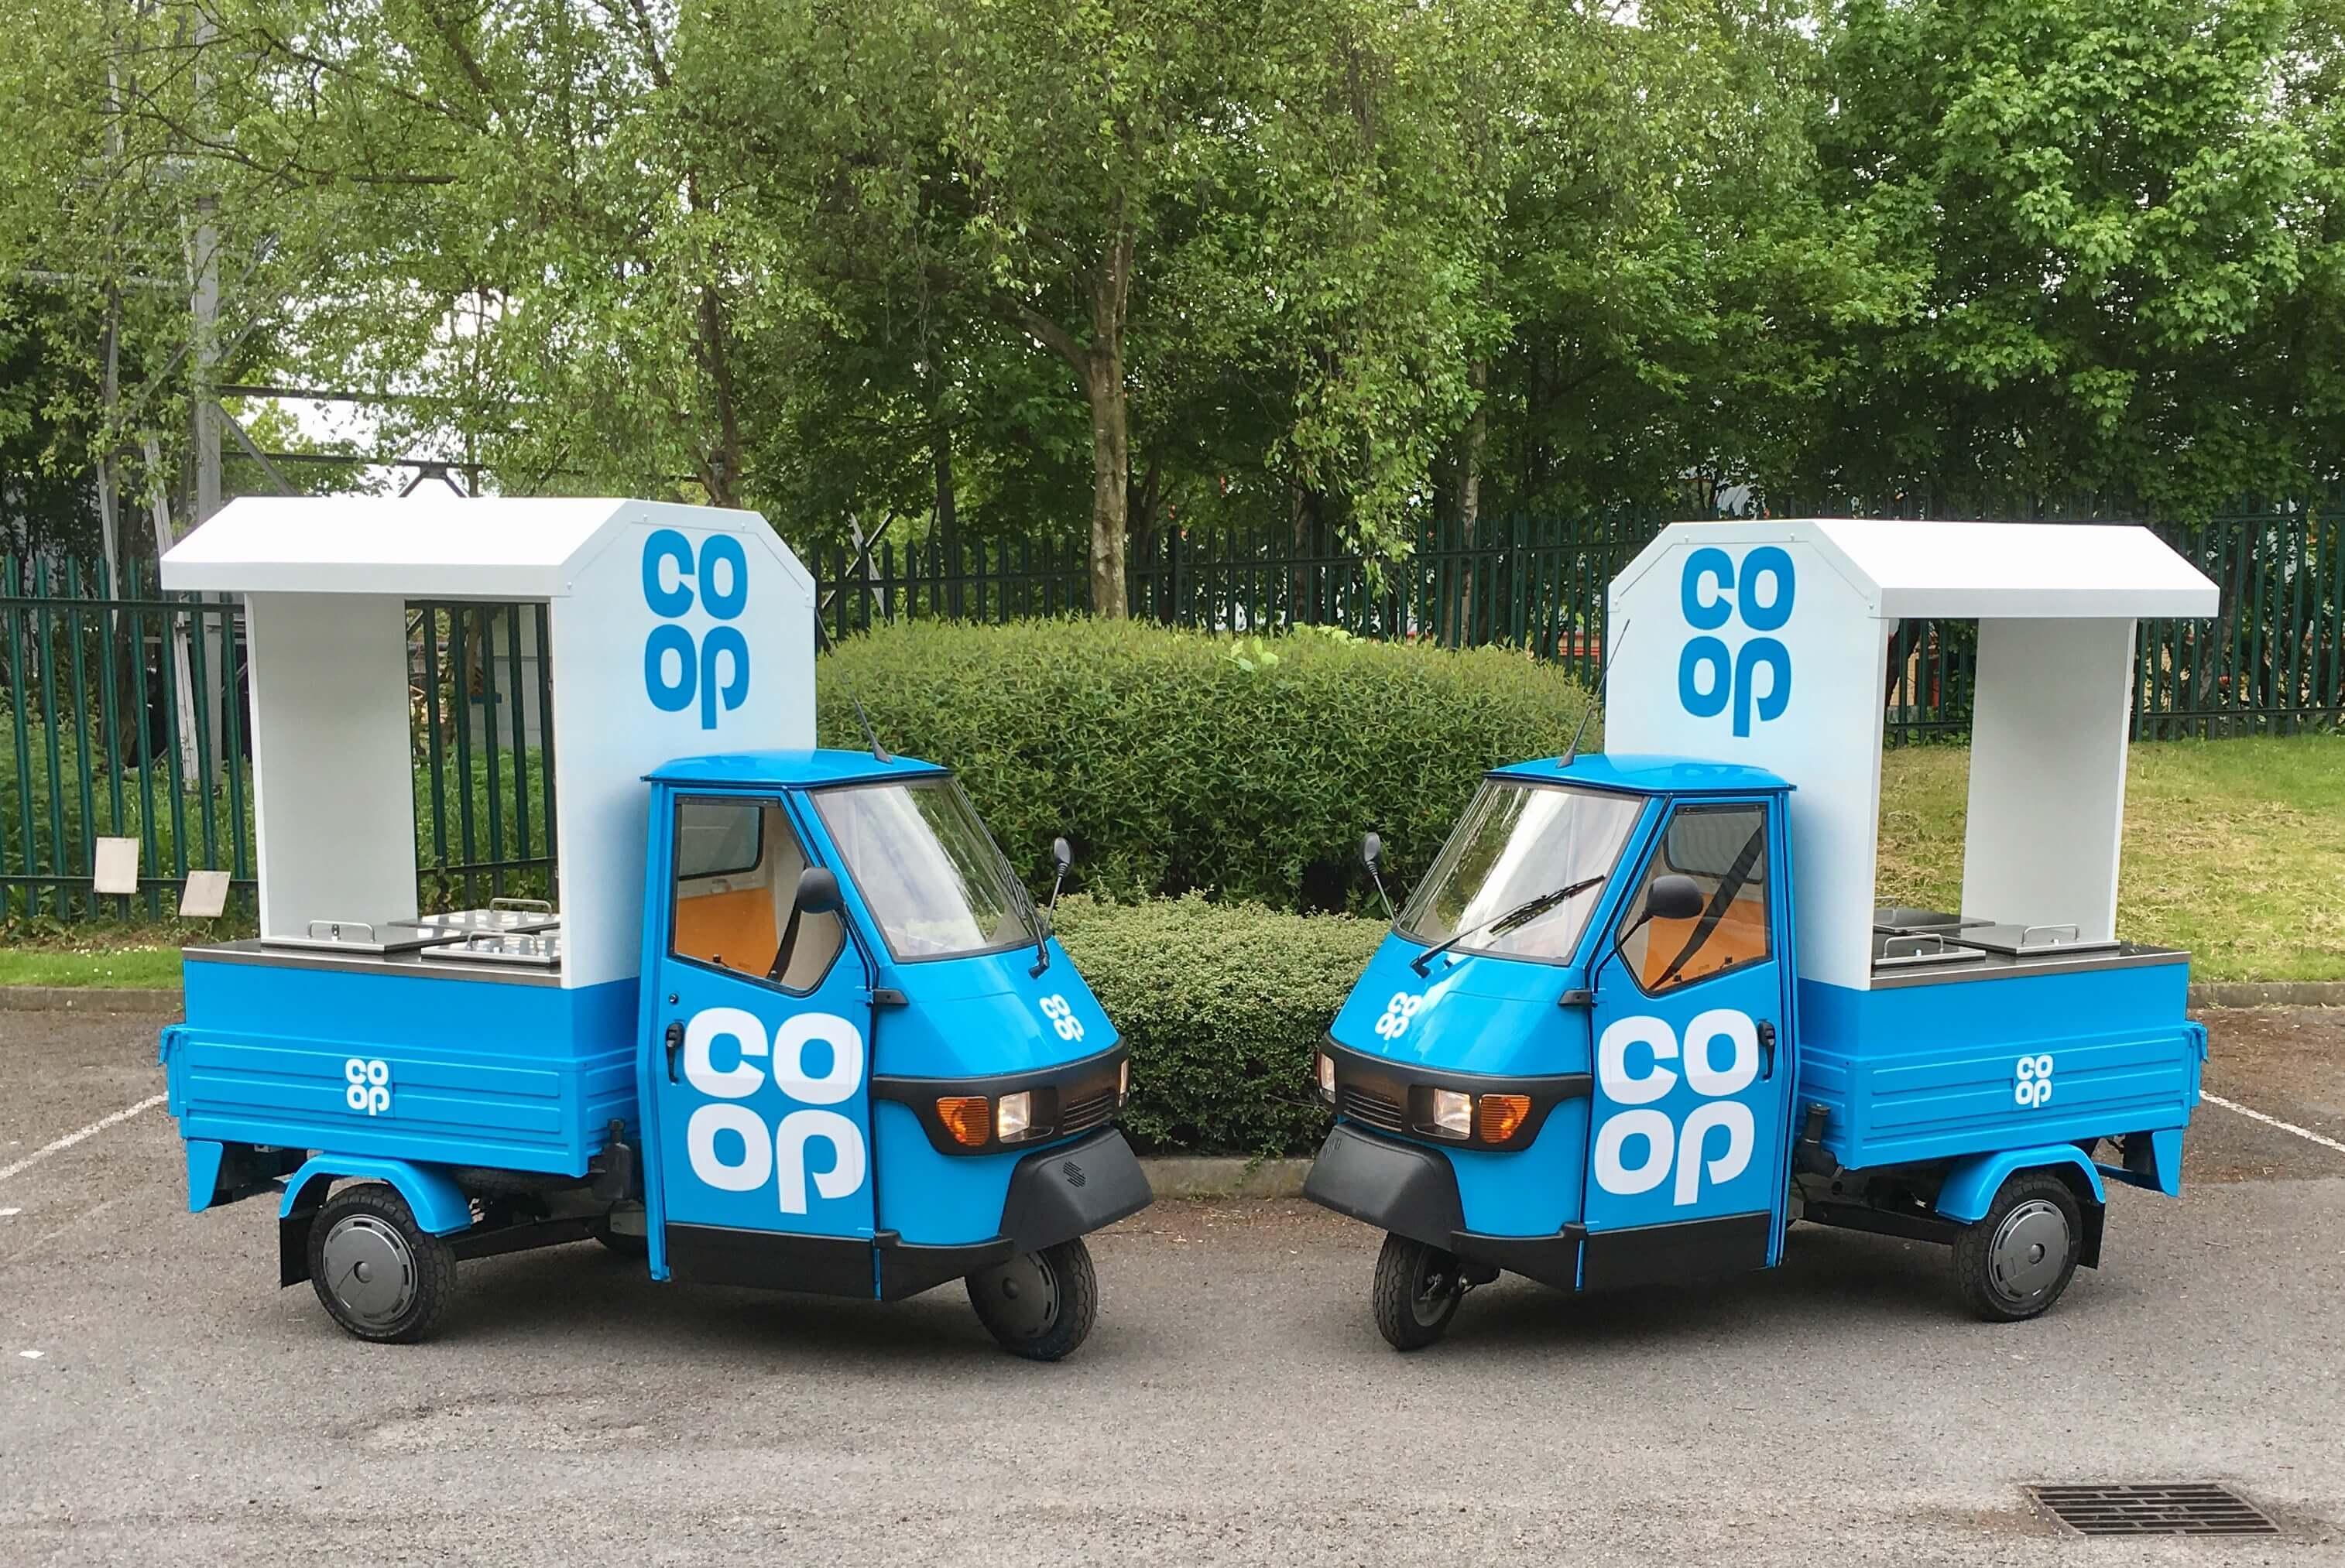 Co op Marketing Vehicles